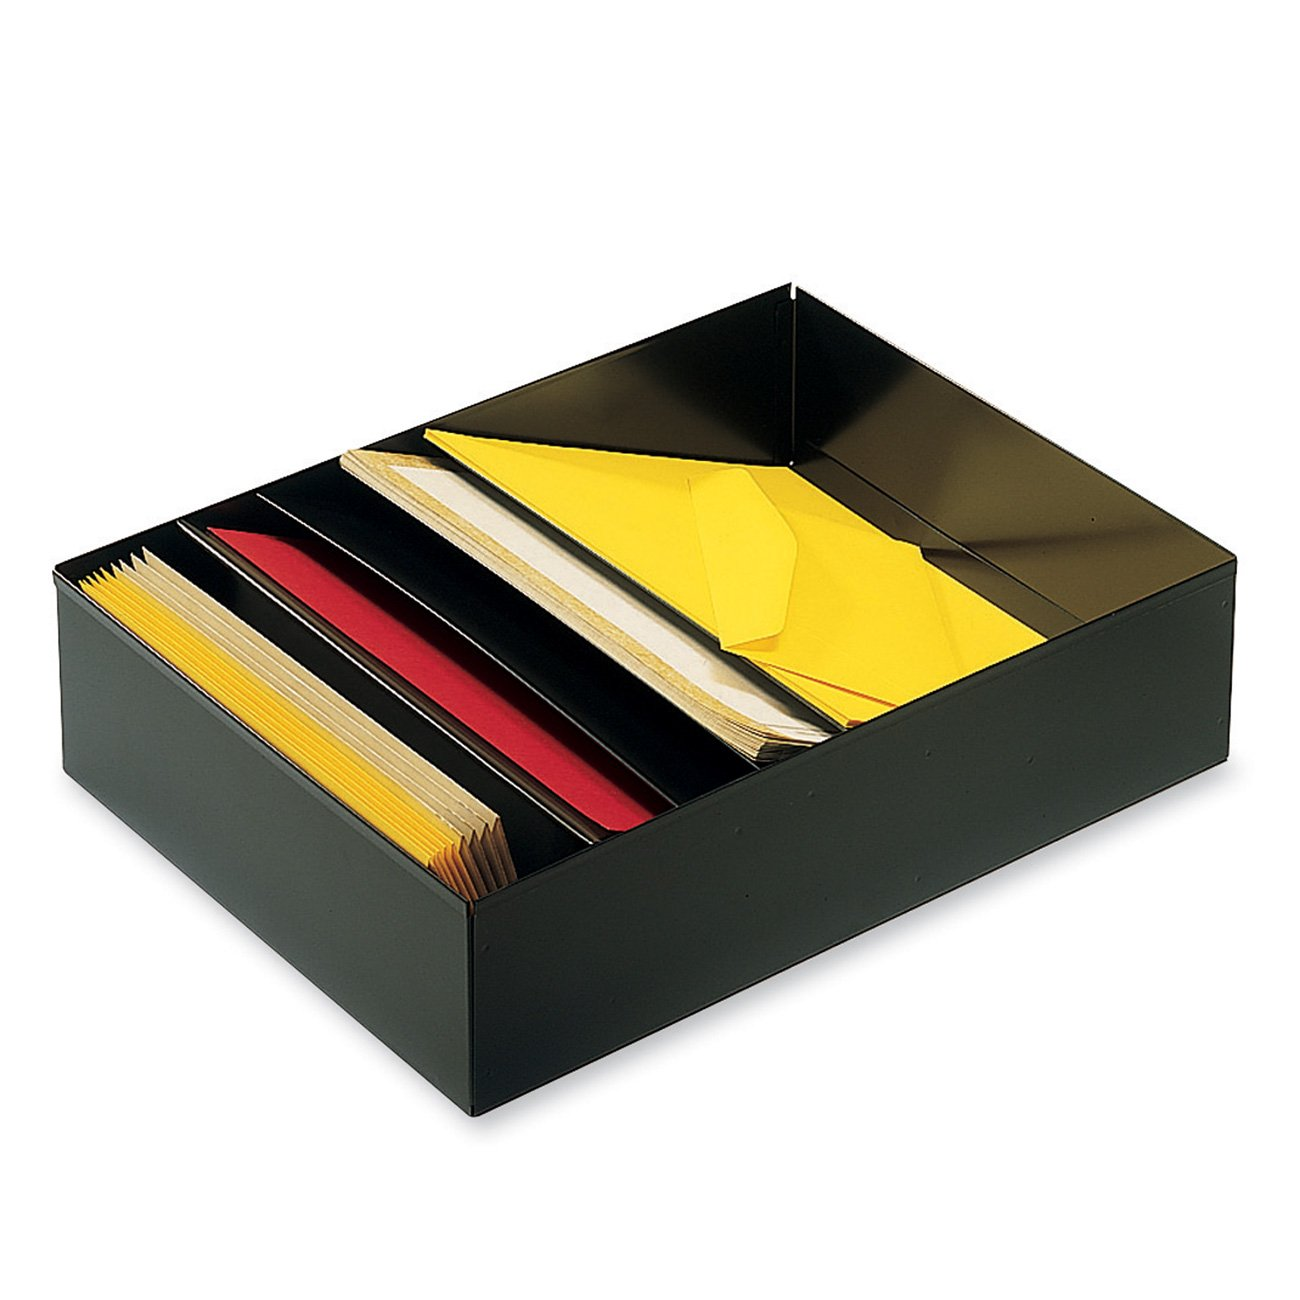 STEELMASTER 5-Compartment Desk Drawer Stationery Holder, 11.38 x 3.75 x 21 Inches, Black (2712SBK)